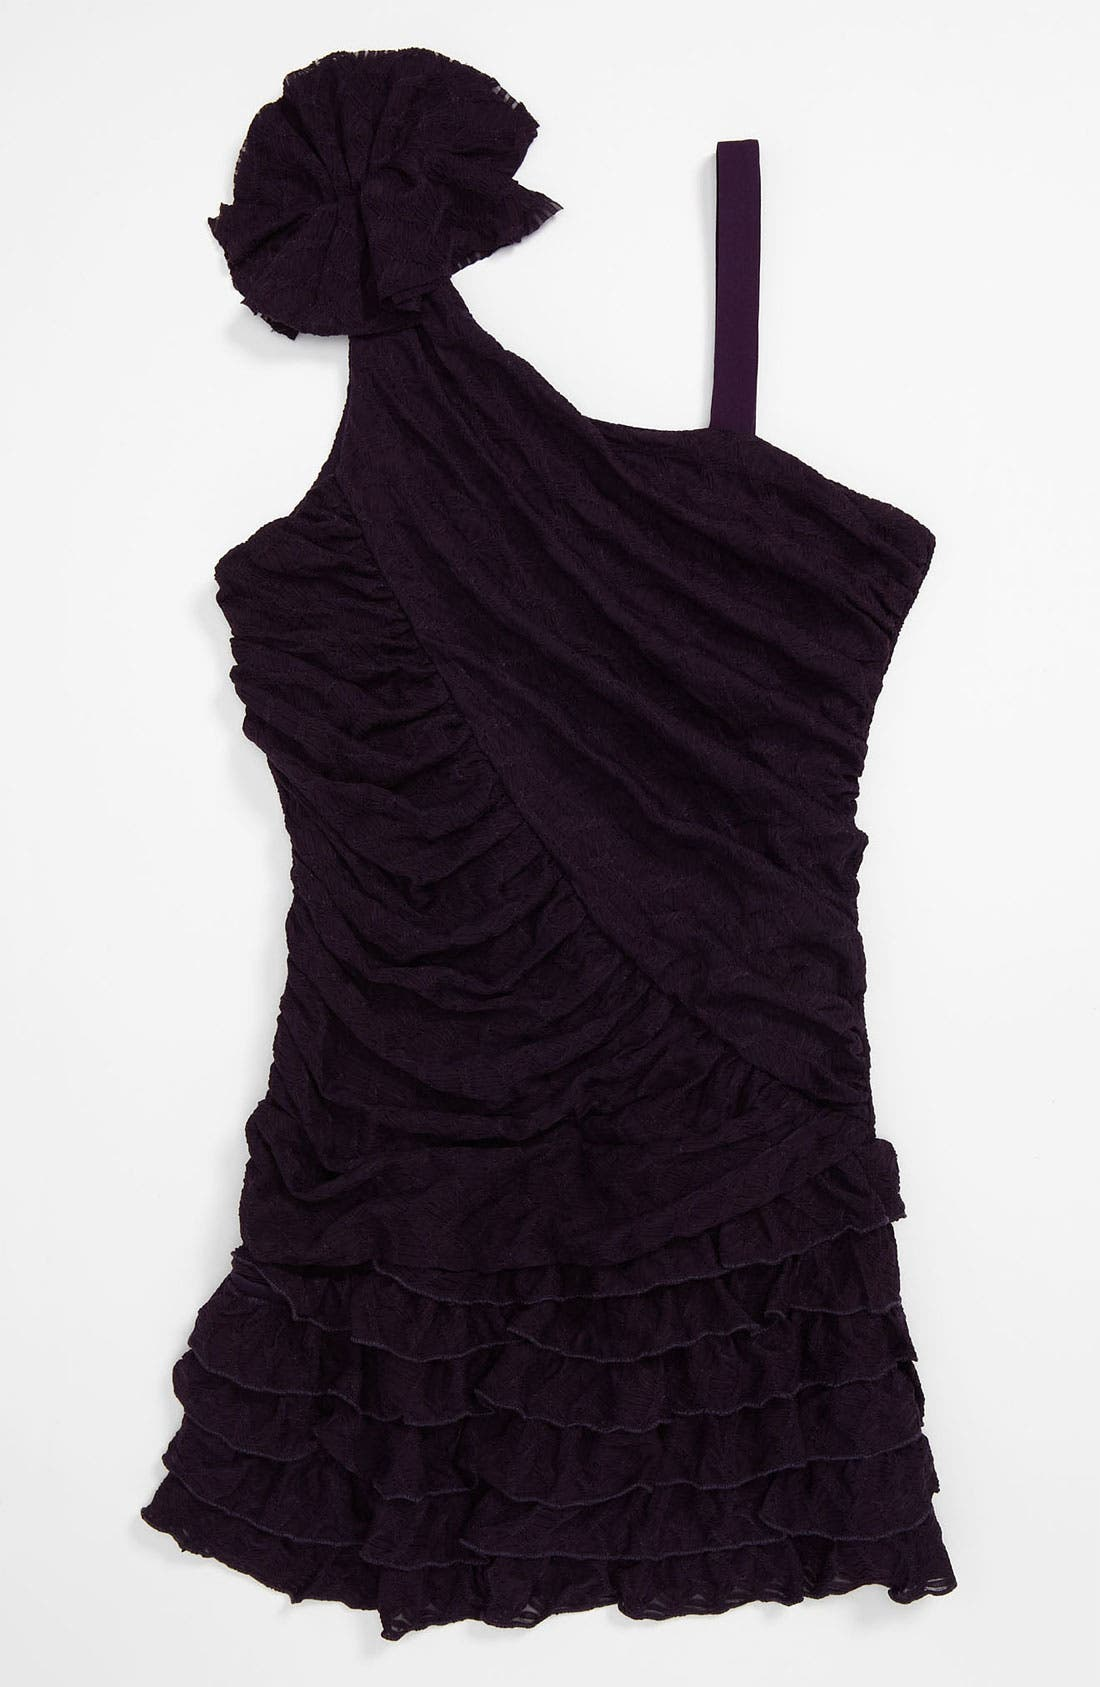 Alternate Image 1 Selected - Elisa B 'Novelty' Knit Dress (Big Girls)